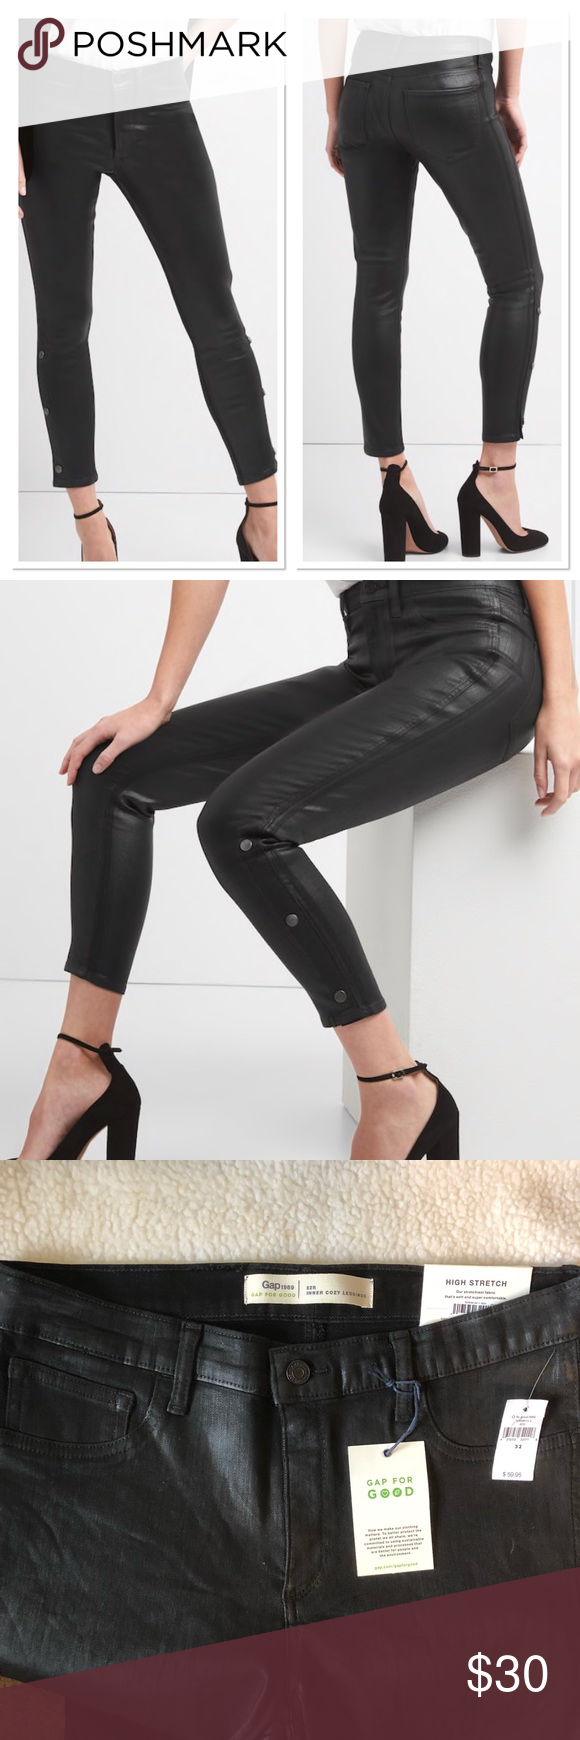 76525e87be3df Gap High Stretch Inner Cozy Leggings GAP Mid Rise Inner Cozy Favorite  Jeggings in Coated Black